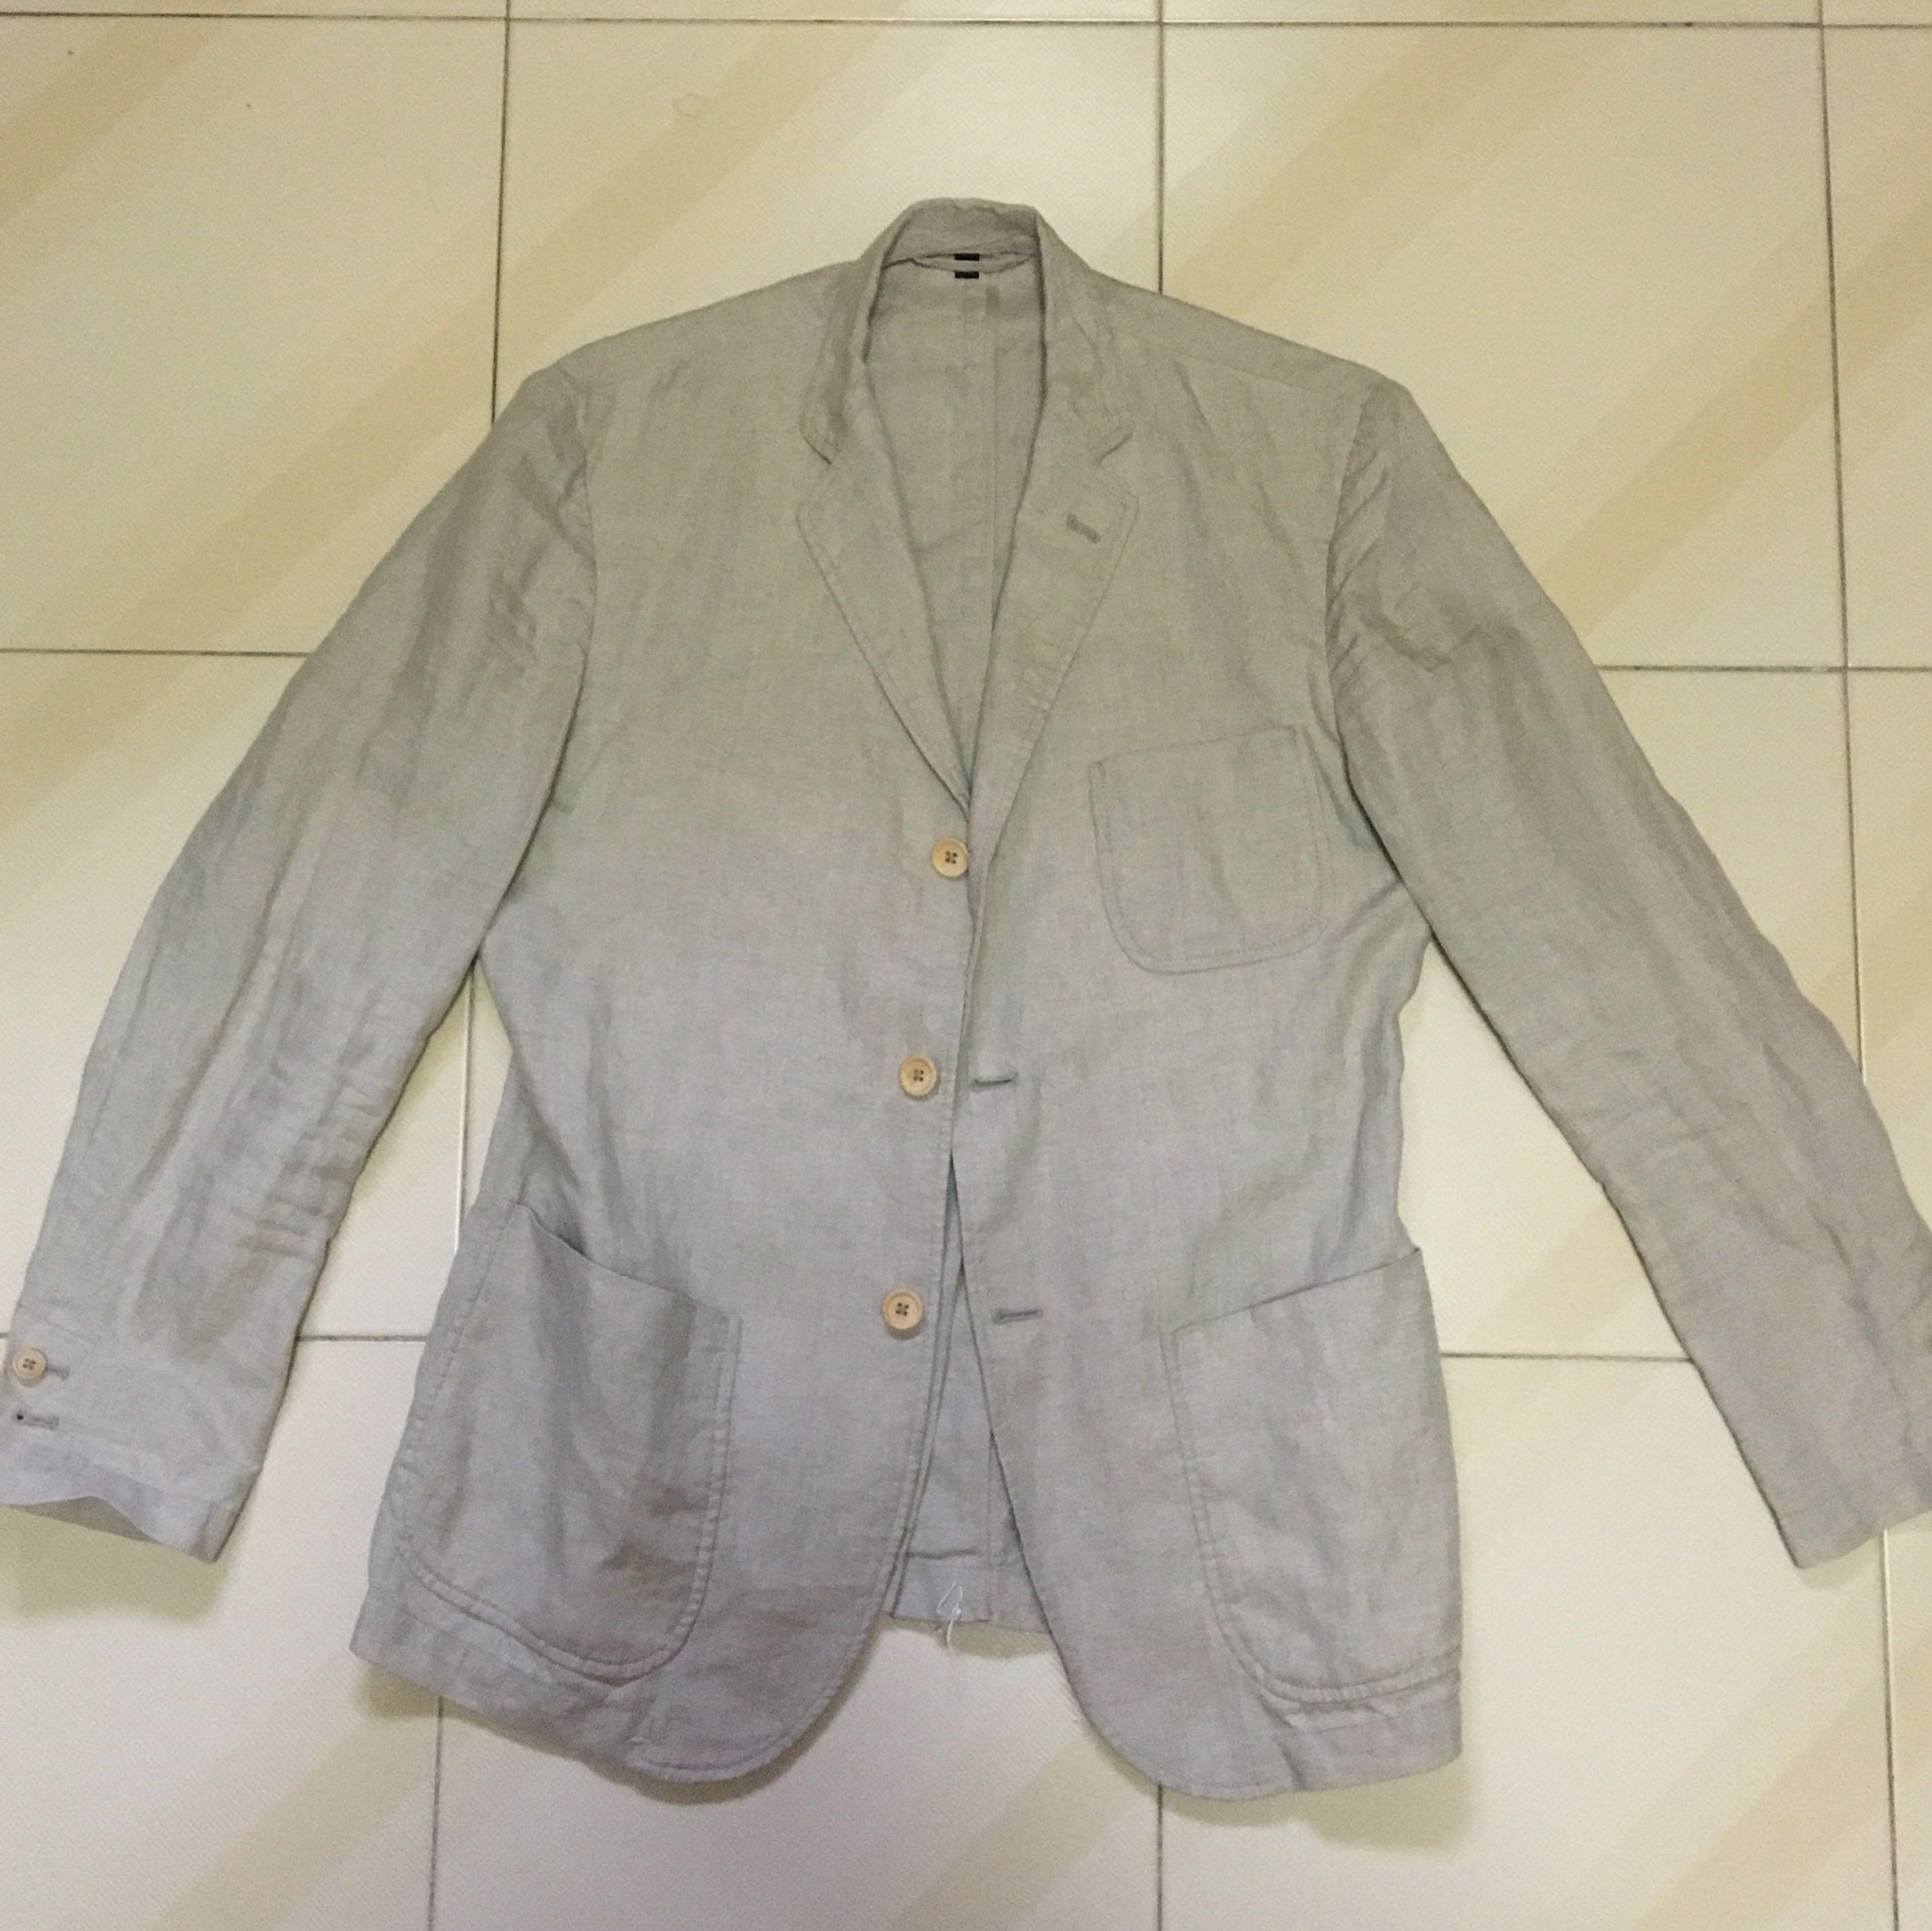 Muji- Linen Lightweight Casual Khaki Color Jacket 77f4a9e82ca69